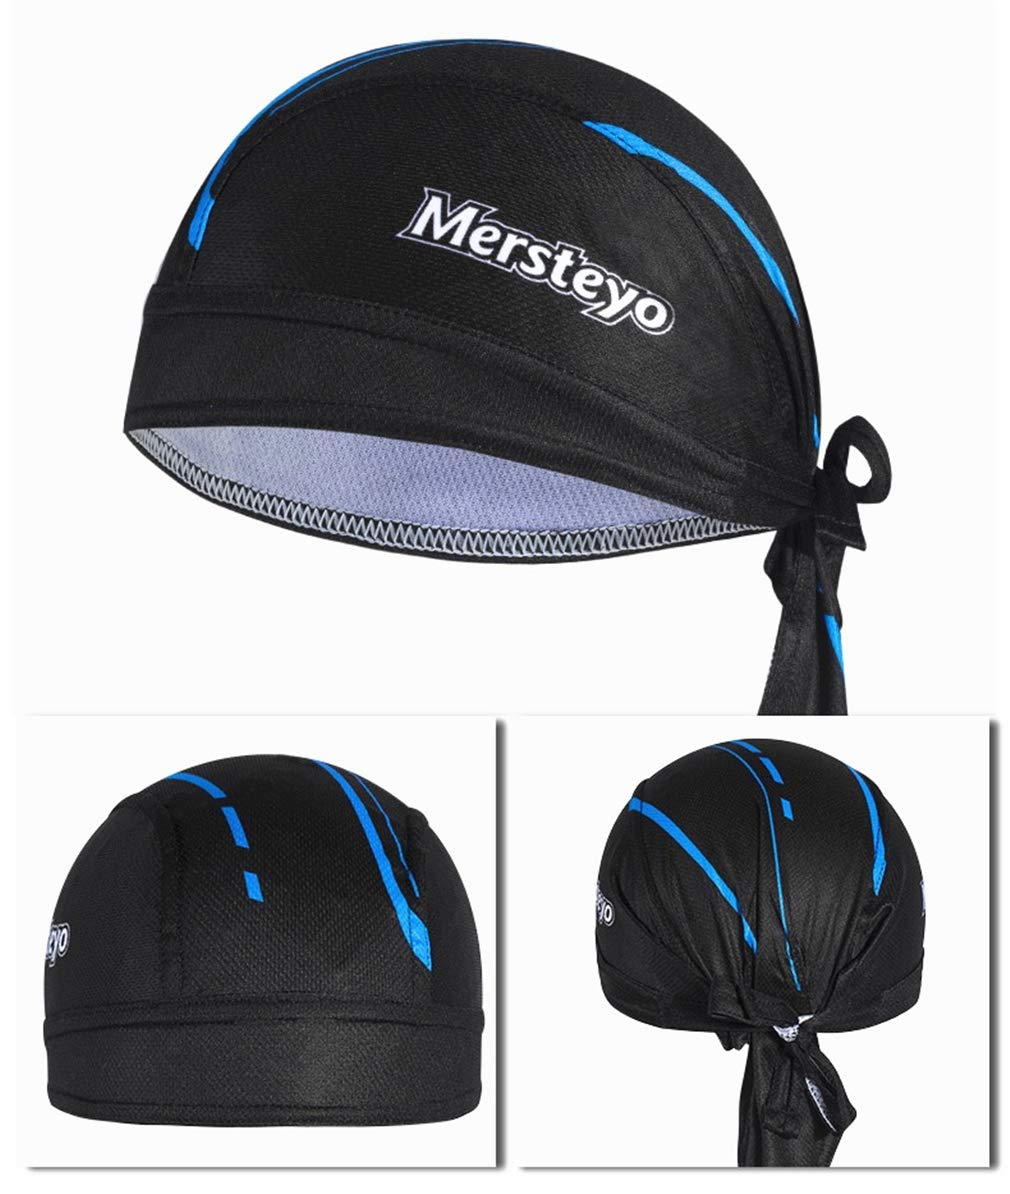 JameStyle26 Bandana Cap Atmungsaktiv Kopftuch Bikertuch UV Schutz Fahrrad Unisex Rad Sport